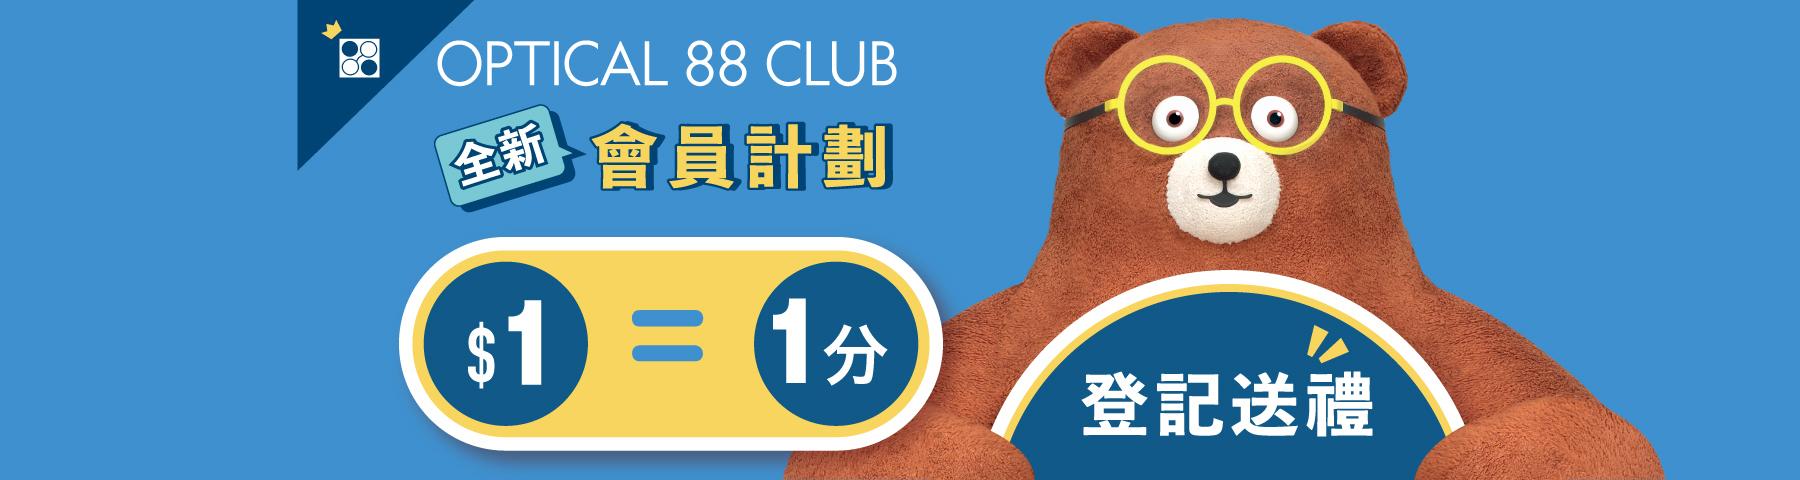 88 Club